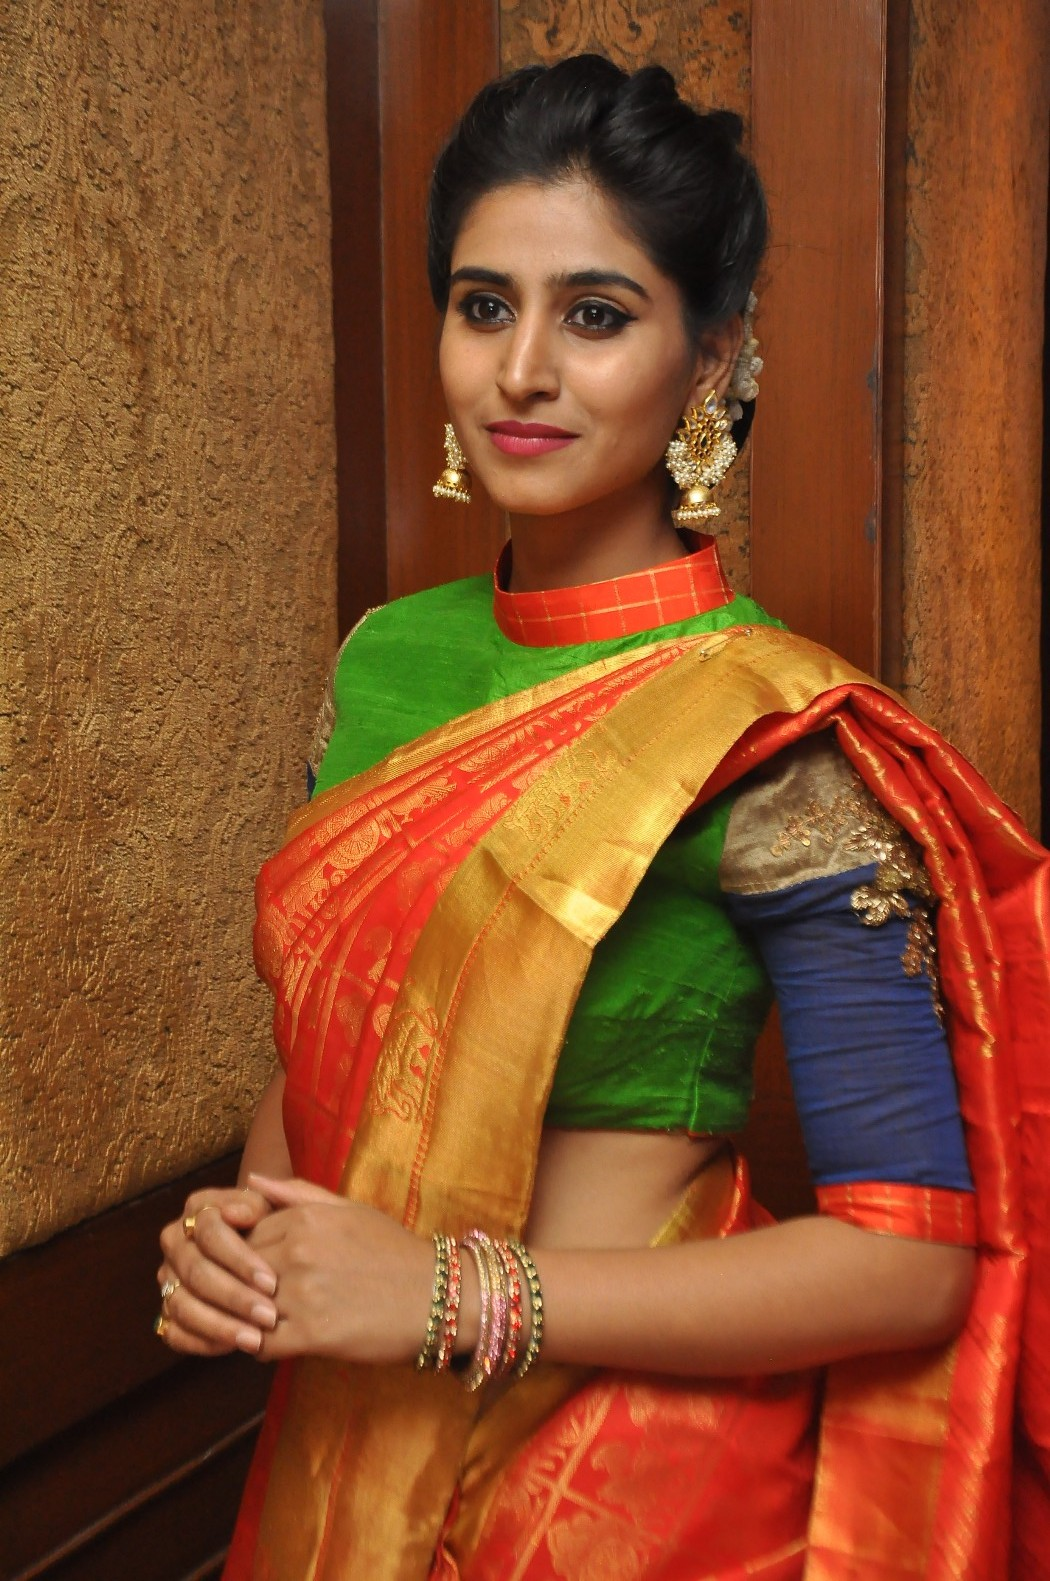 Love For Handloom Celebs and Models Dazzle In Elegant Outfit   Love For Handloom Praneetha Love For Handloom 462